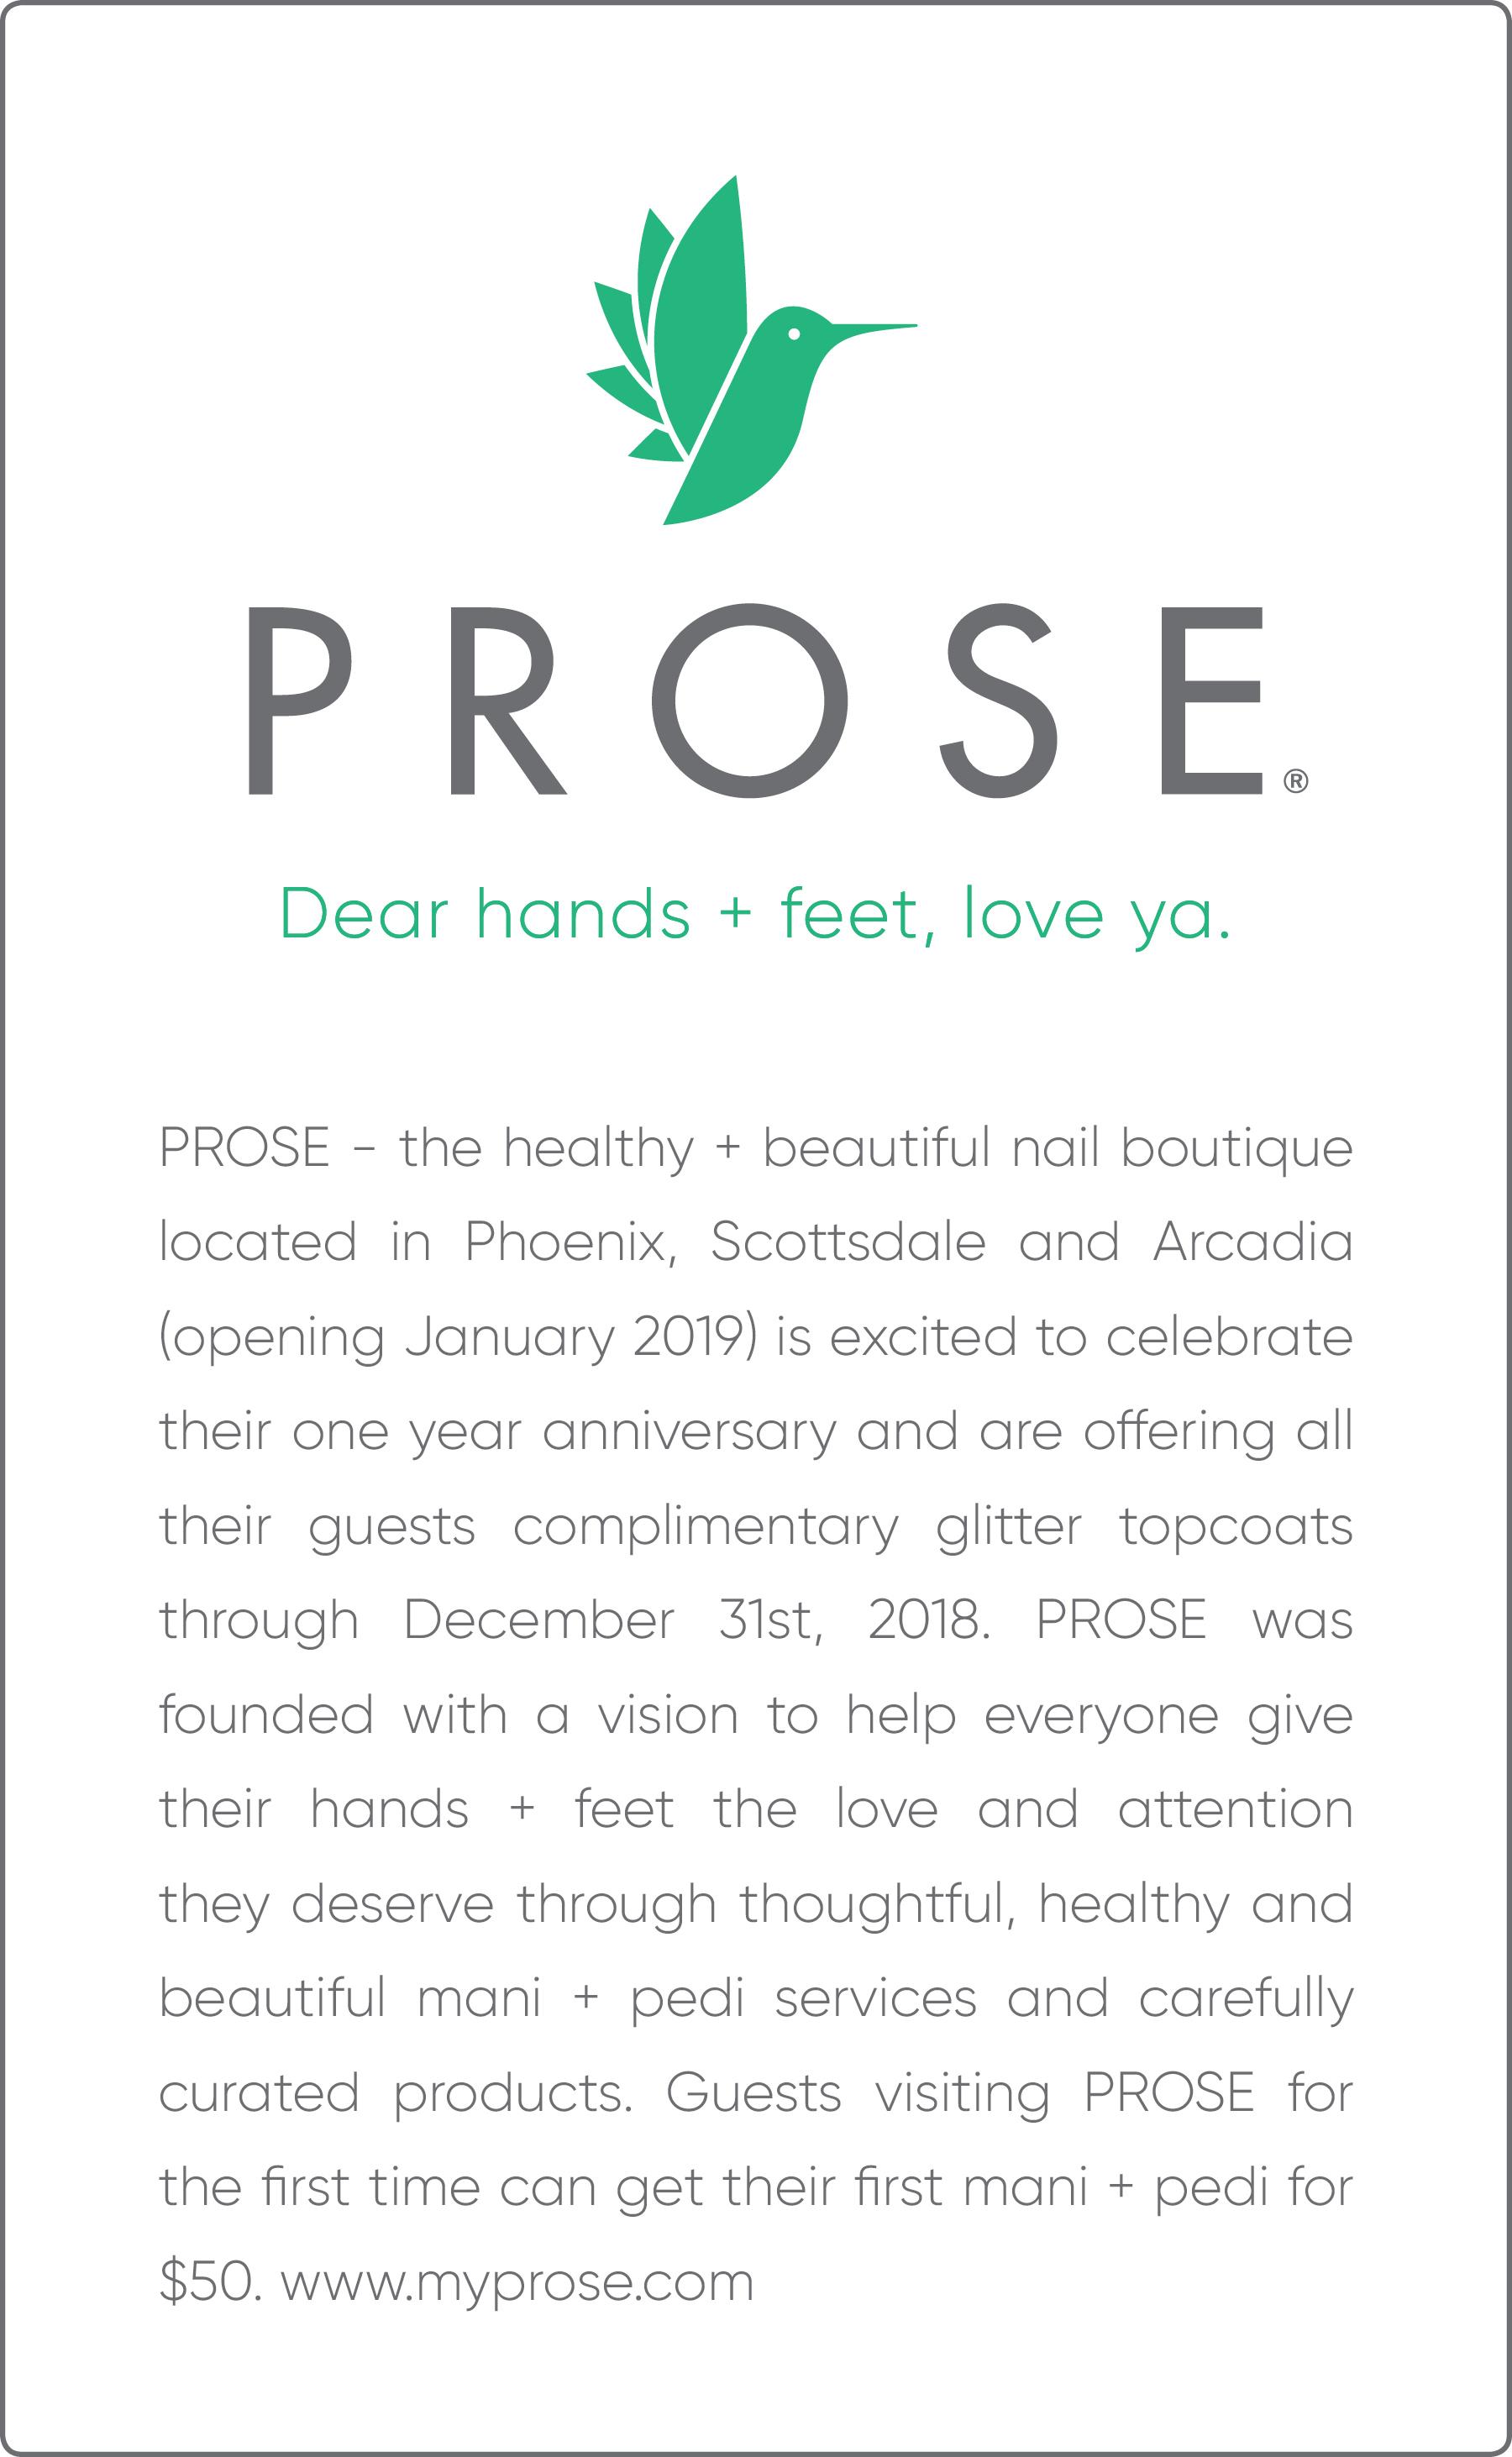 PROSE WebSheet.jpg